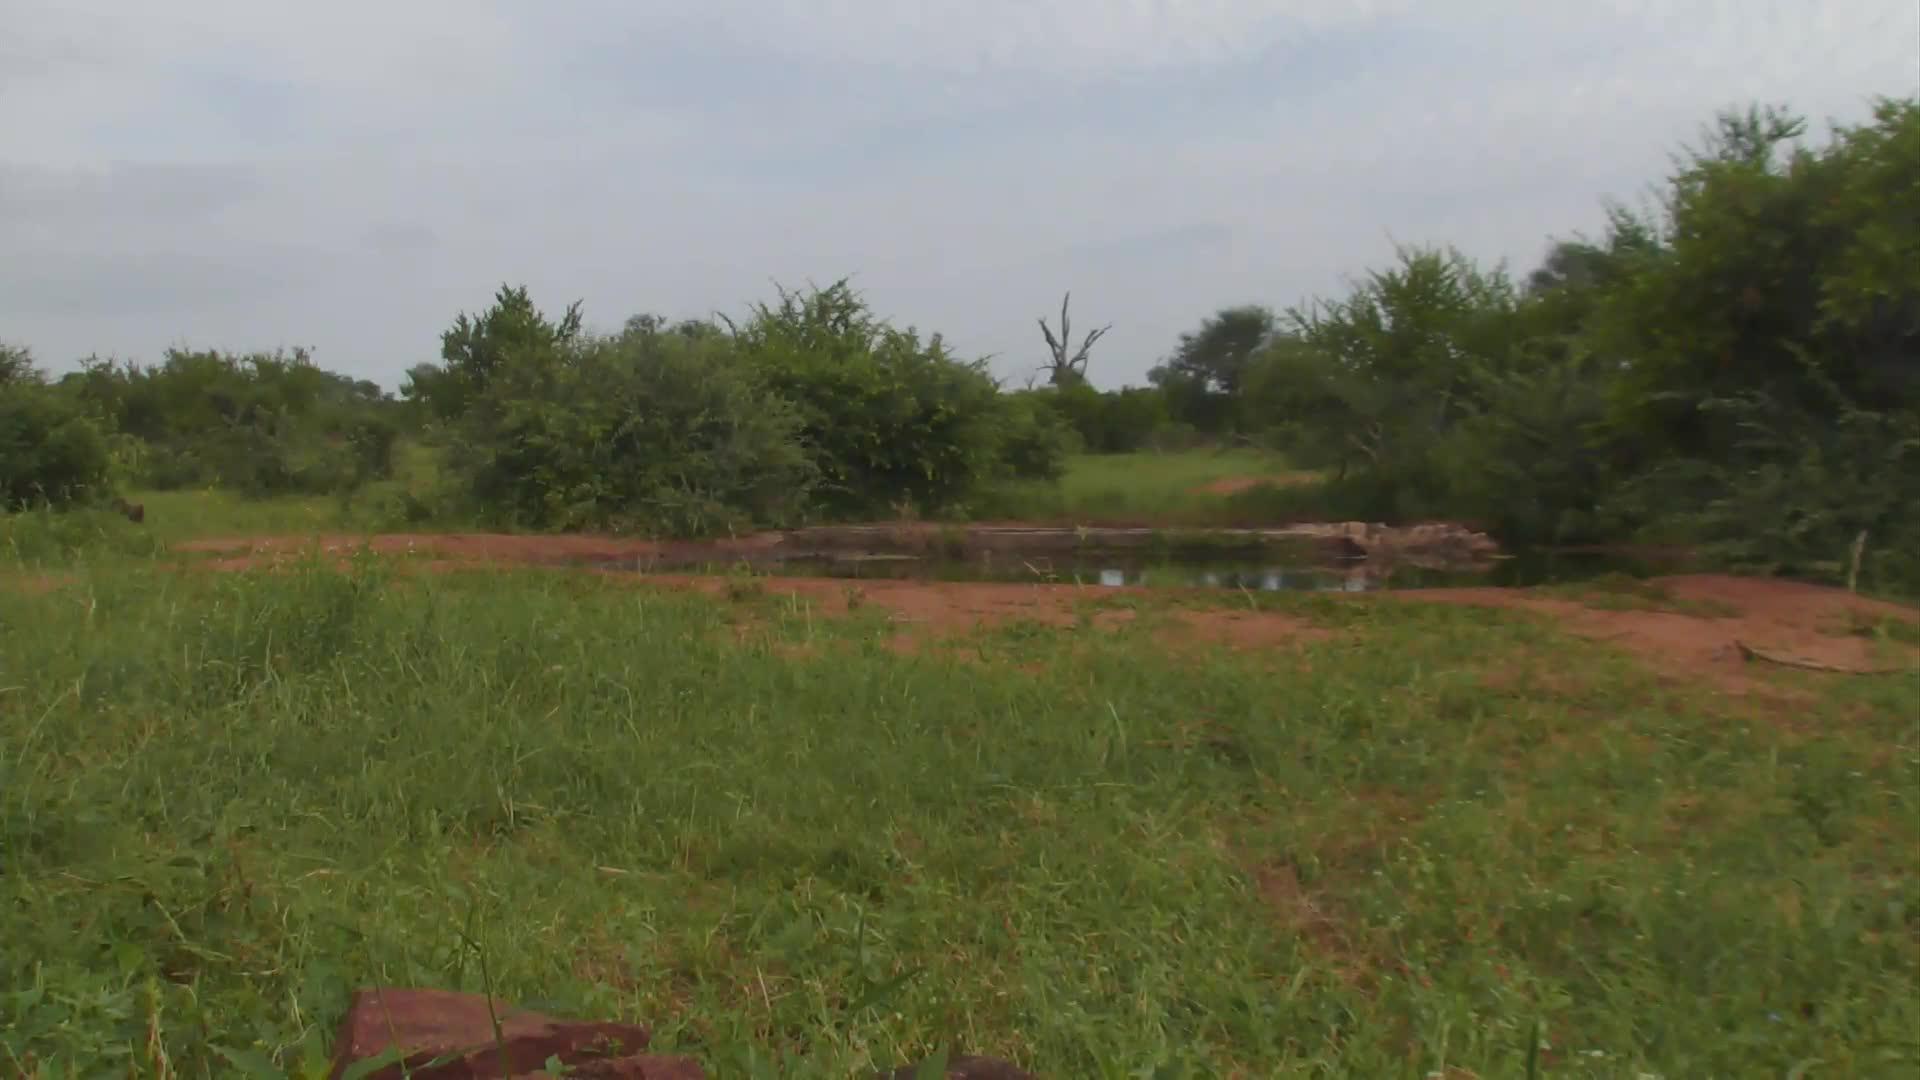 VIDEO: African Wild Dogs left the waterhole area